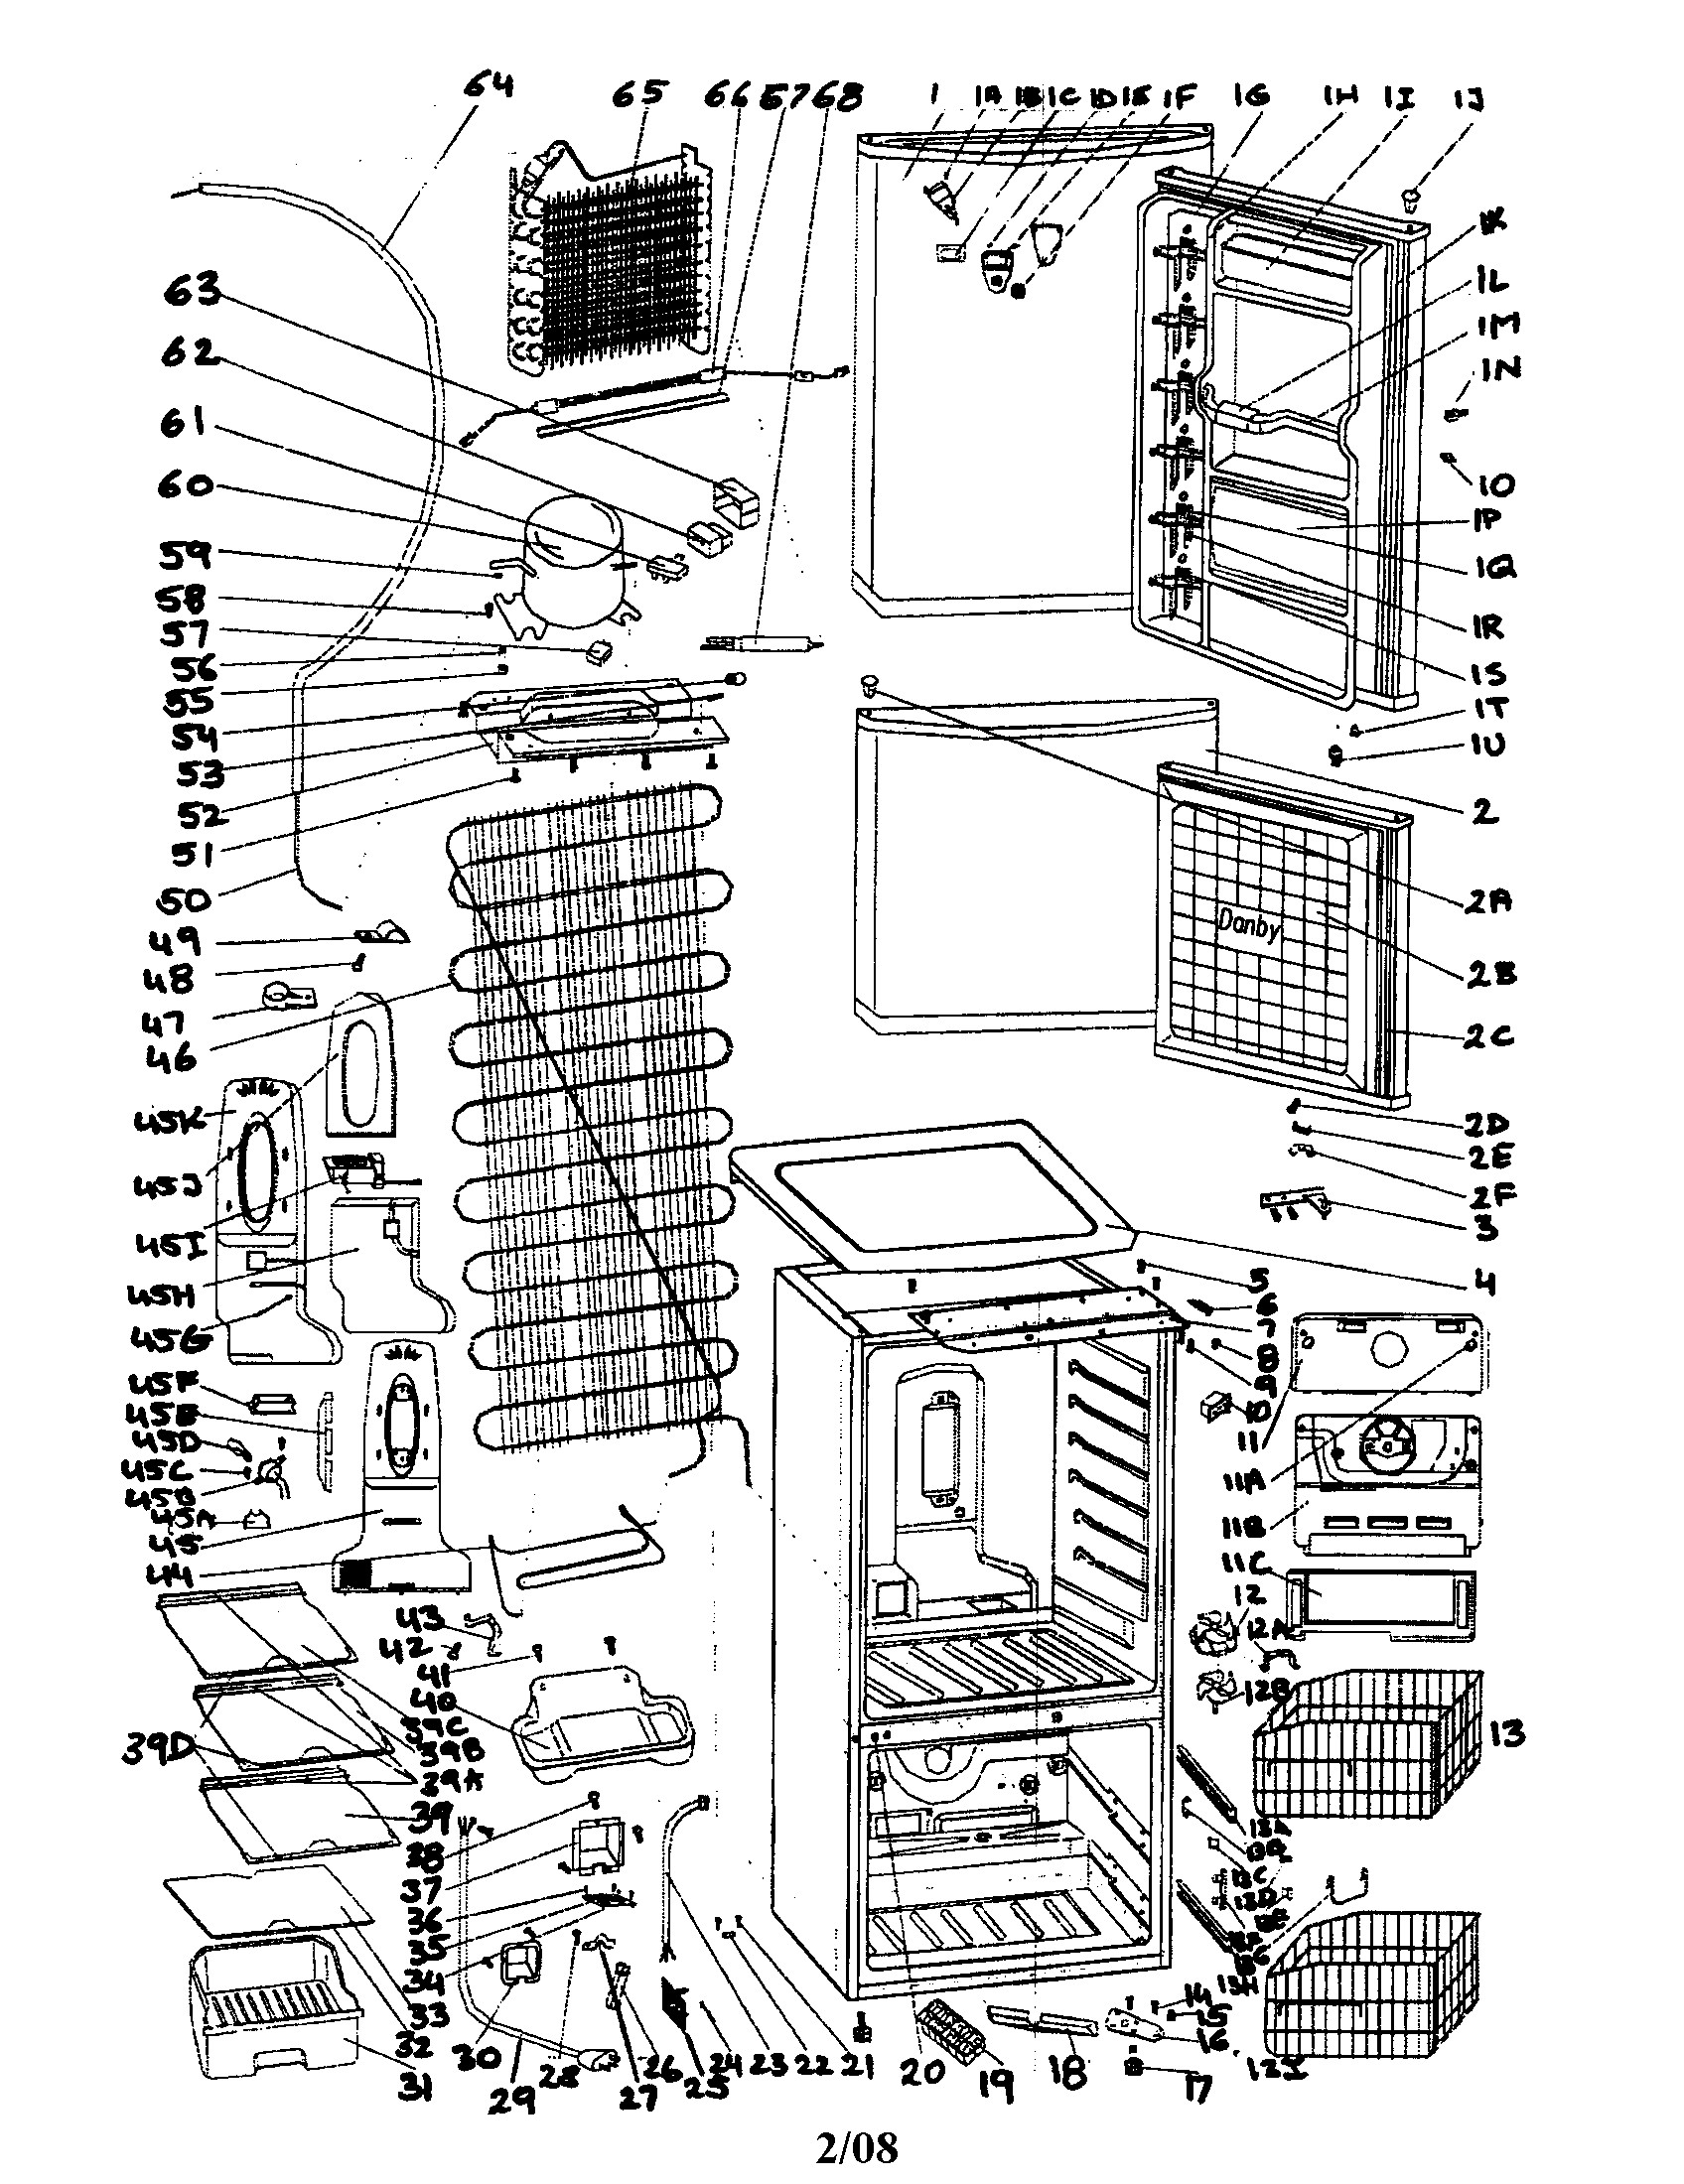 Danby Kegerator Parts Diagram Best Consumer Rated Refrigerators April 2017 Of Danby Kegerator Parts Diagram